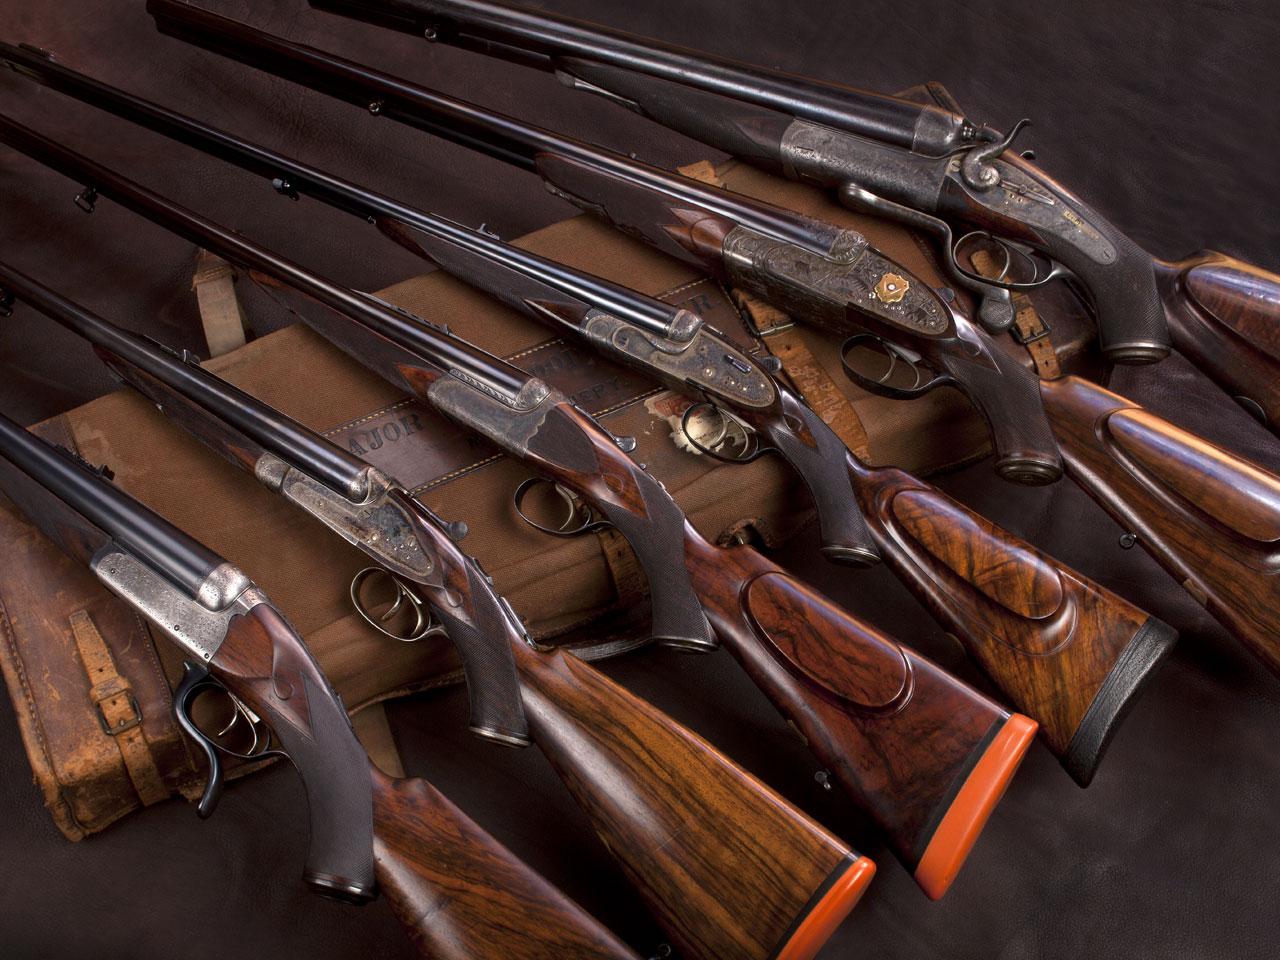 Annunci Armi Usate Fucili Da Caccia Cani Da Caccia